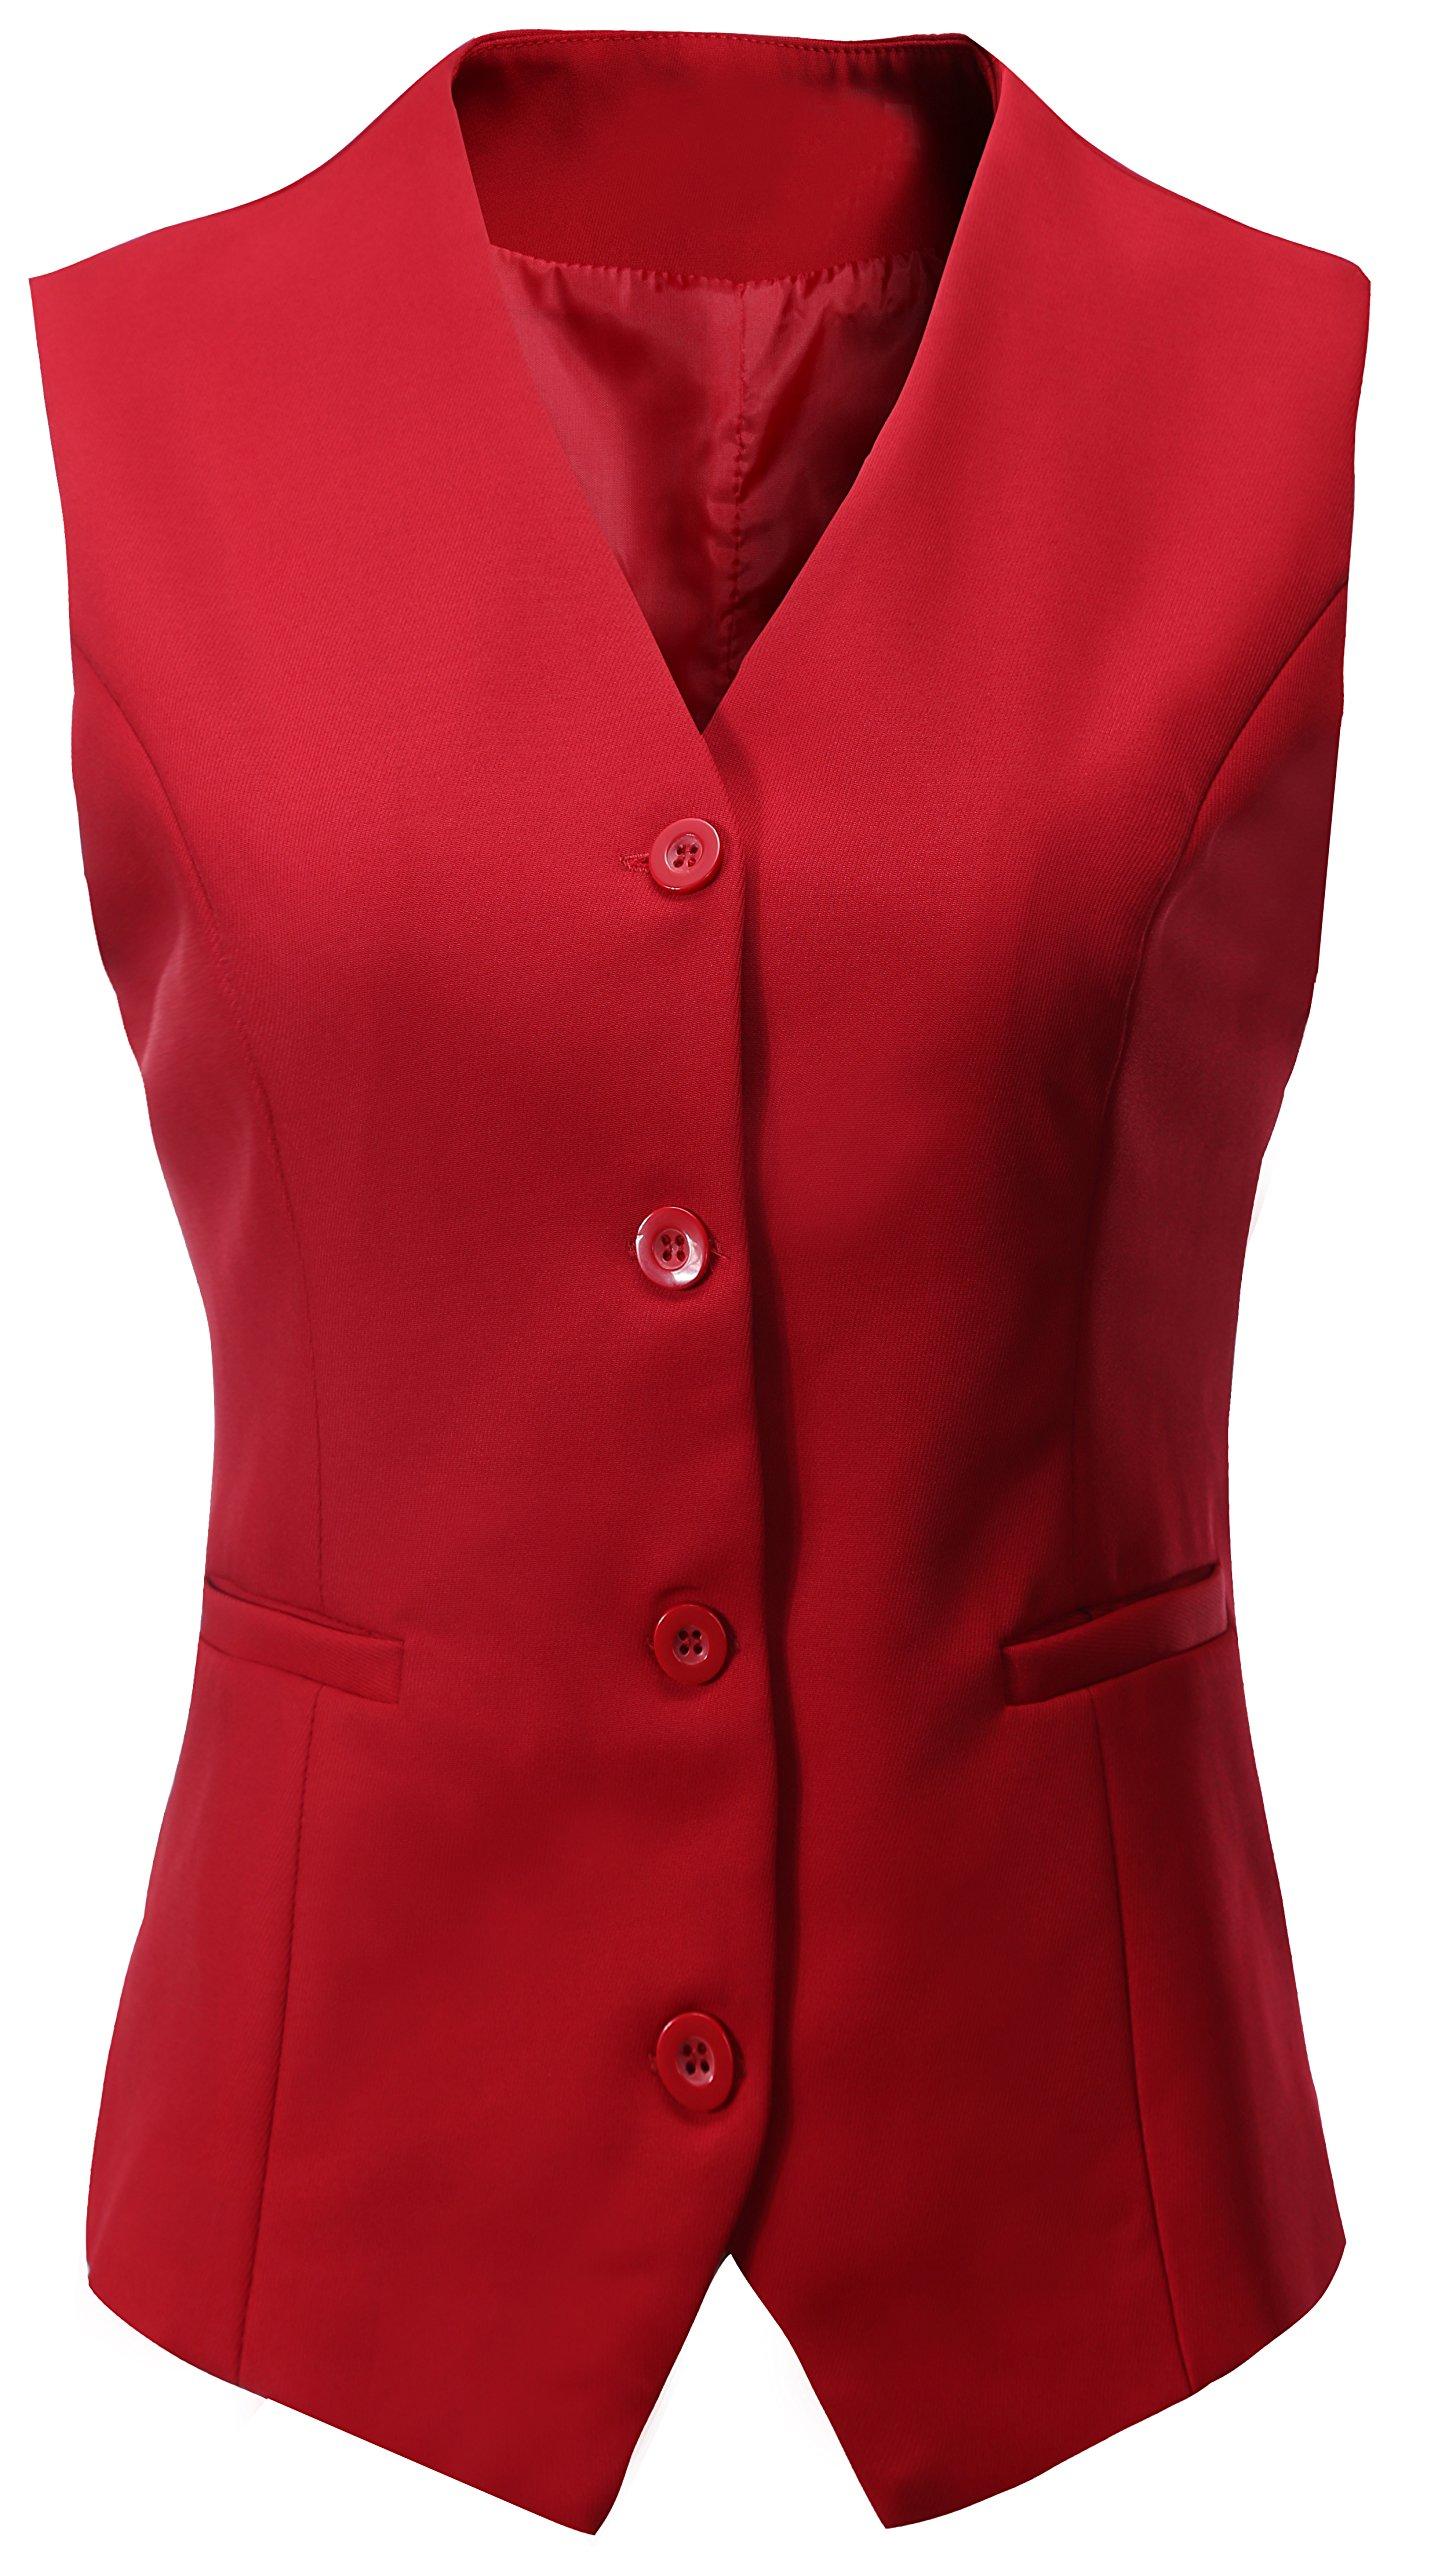 Vocni Women's Fully Lined 4 Button V-Neck Economy Dressy Suit Vest Waistcoat,Red,US L/Asia 5XL